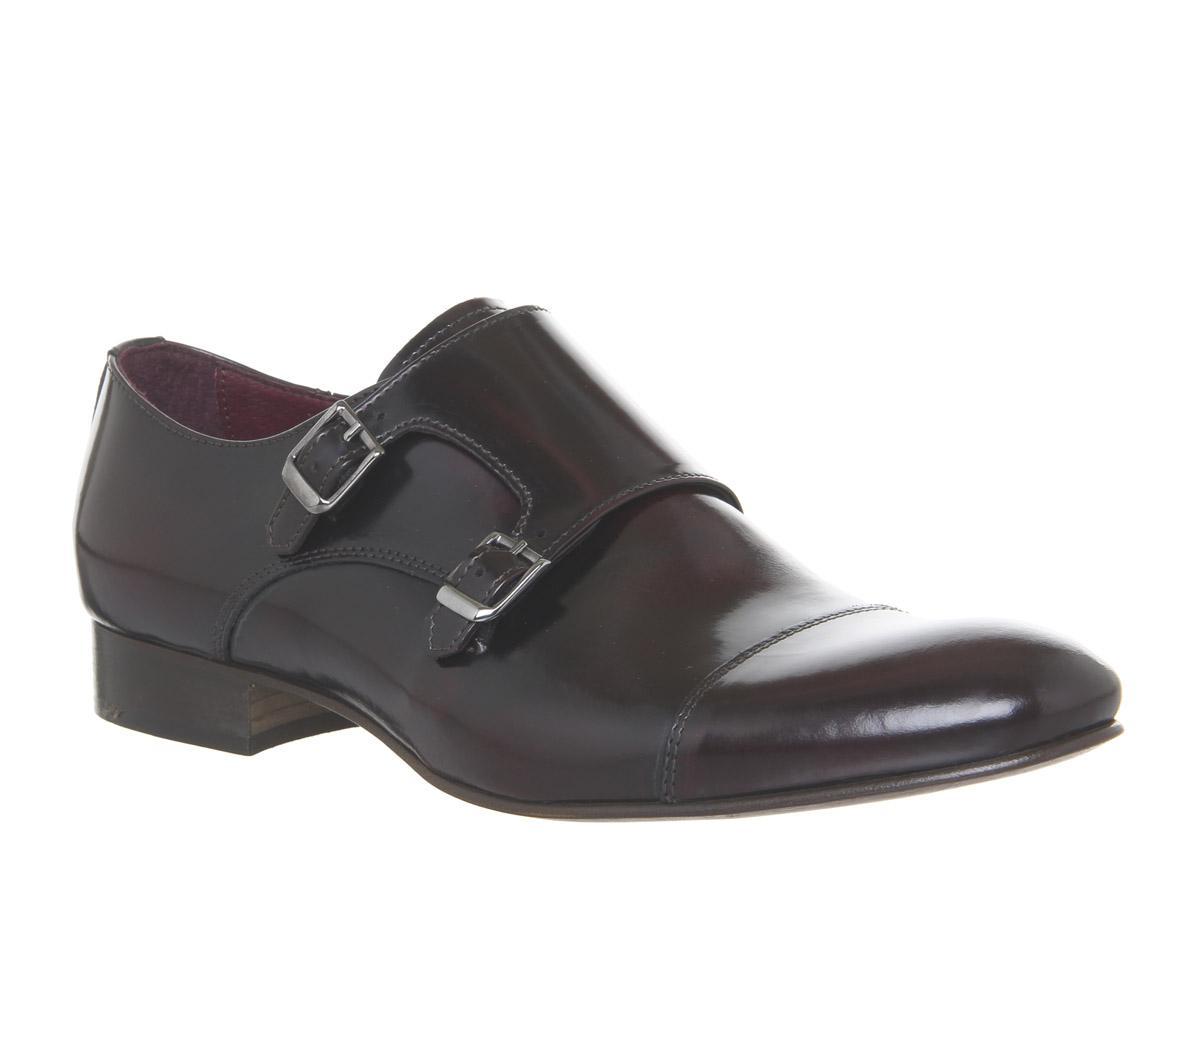 Italiano Double Monk Shoes